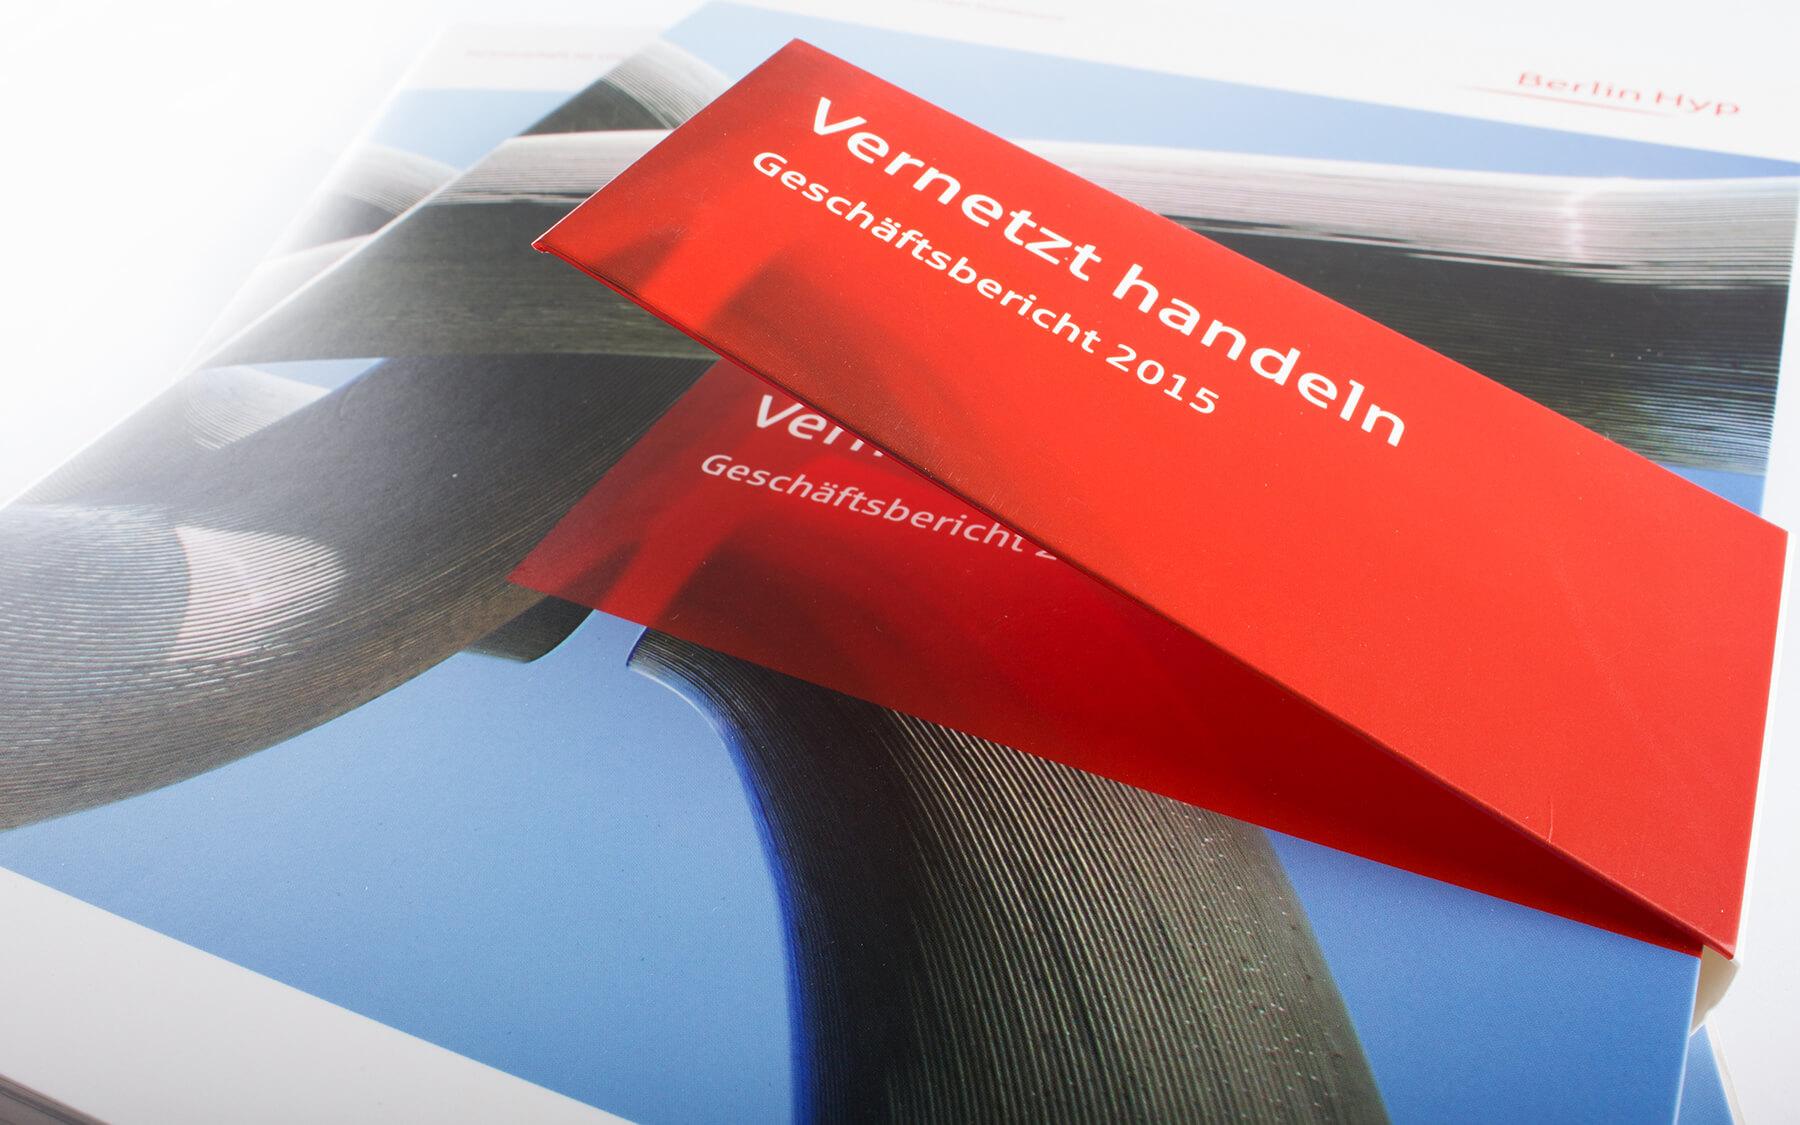 print-agentur-kataloge-werbematerial-stationery-plakate-kampagnen-werbeagentur-berlin-corporate-design- mappe